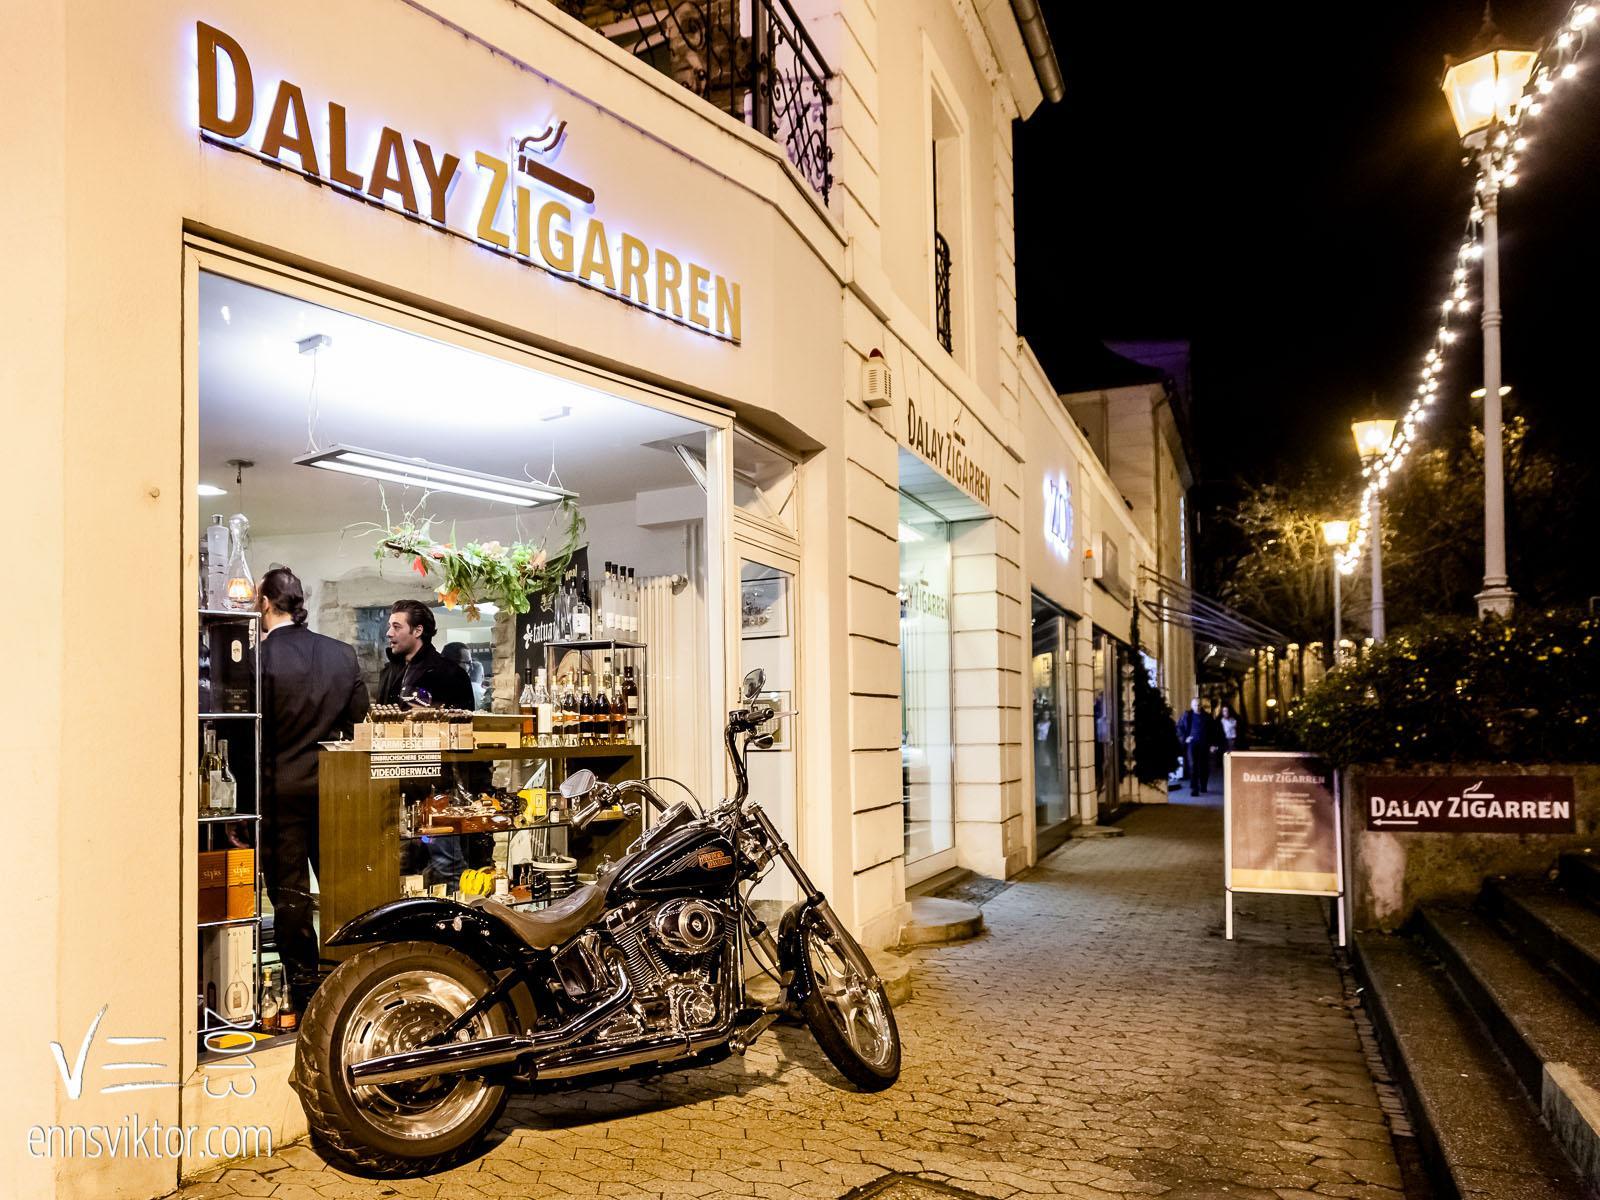 Hinterließ bleibenden Eindruck: Tatuaje-Zigarrenabend bei DALAY ZIGARREN in Saarbrücken